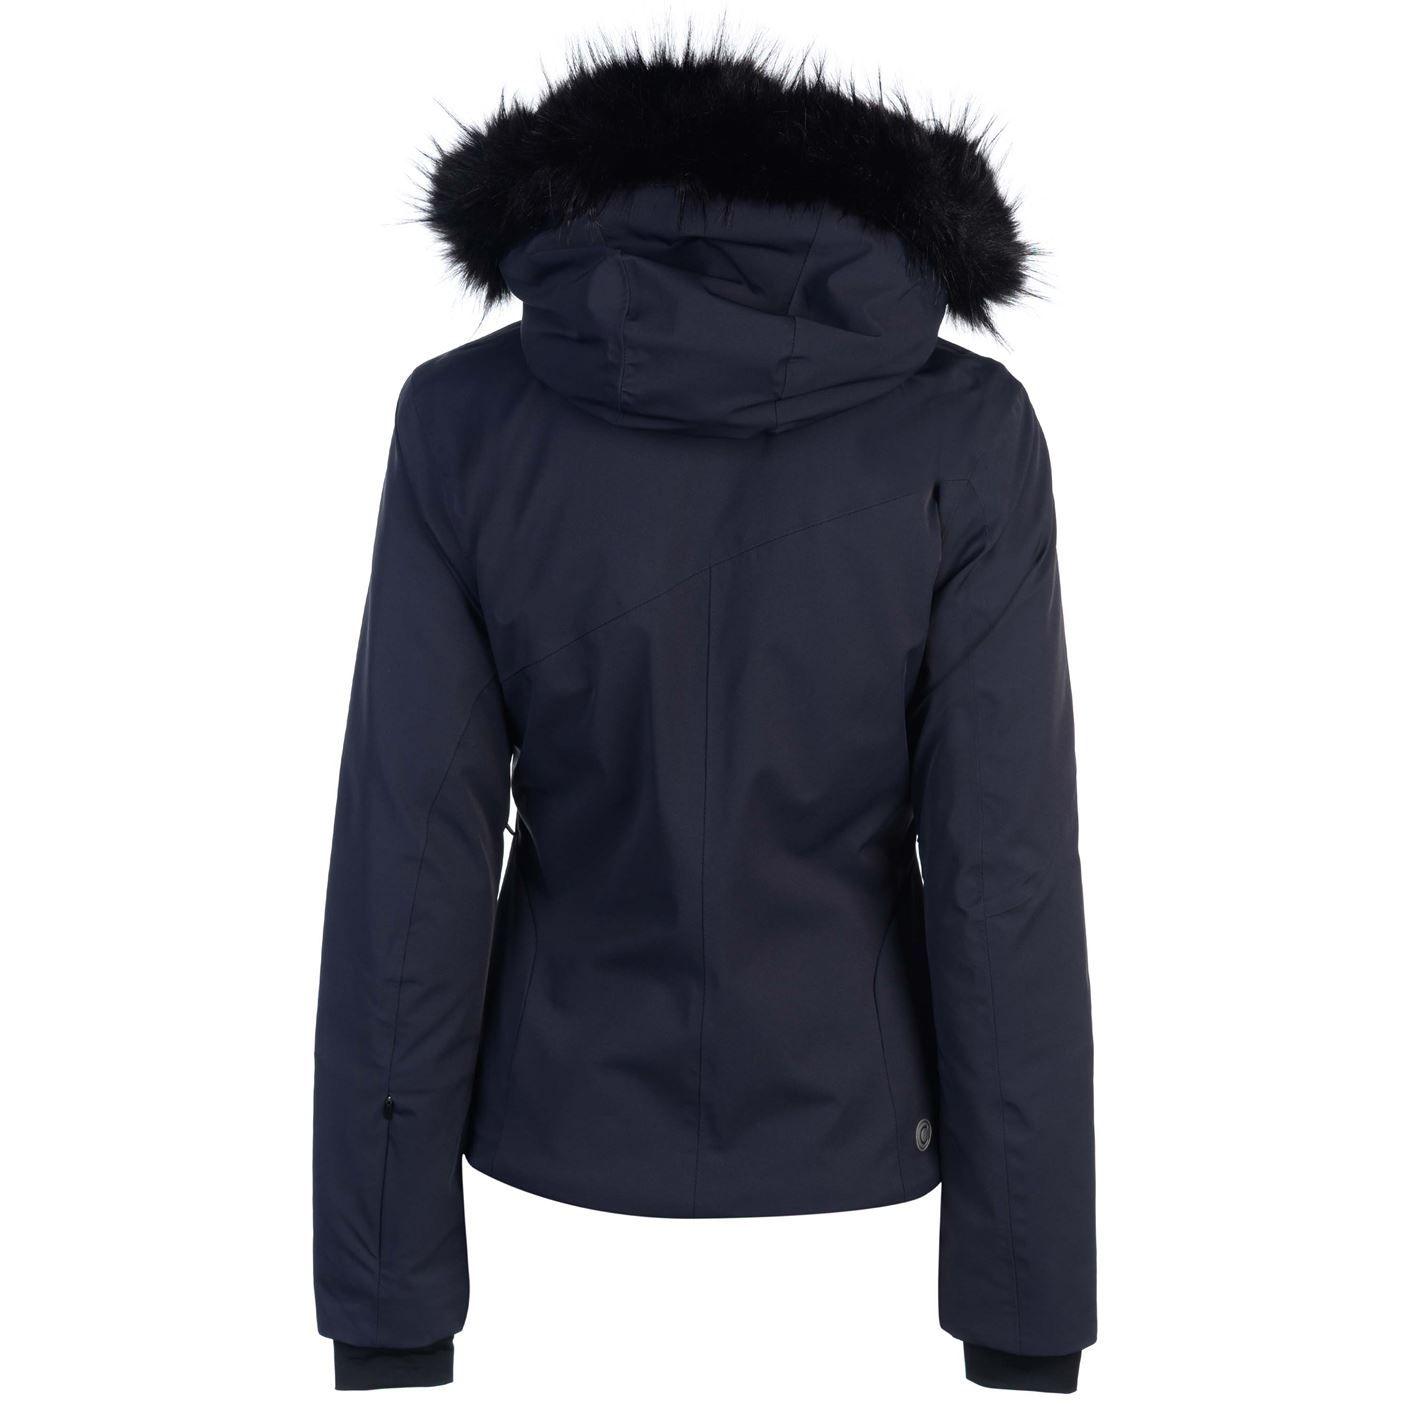 Colmar Womens Ecostretch Ski Jacket Coat Top Waterproof Breathable ... 344b4567f